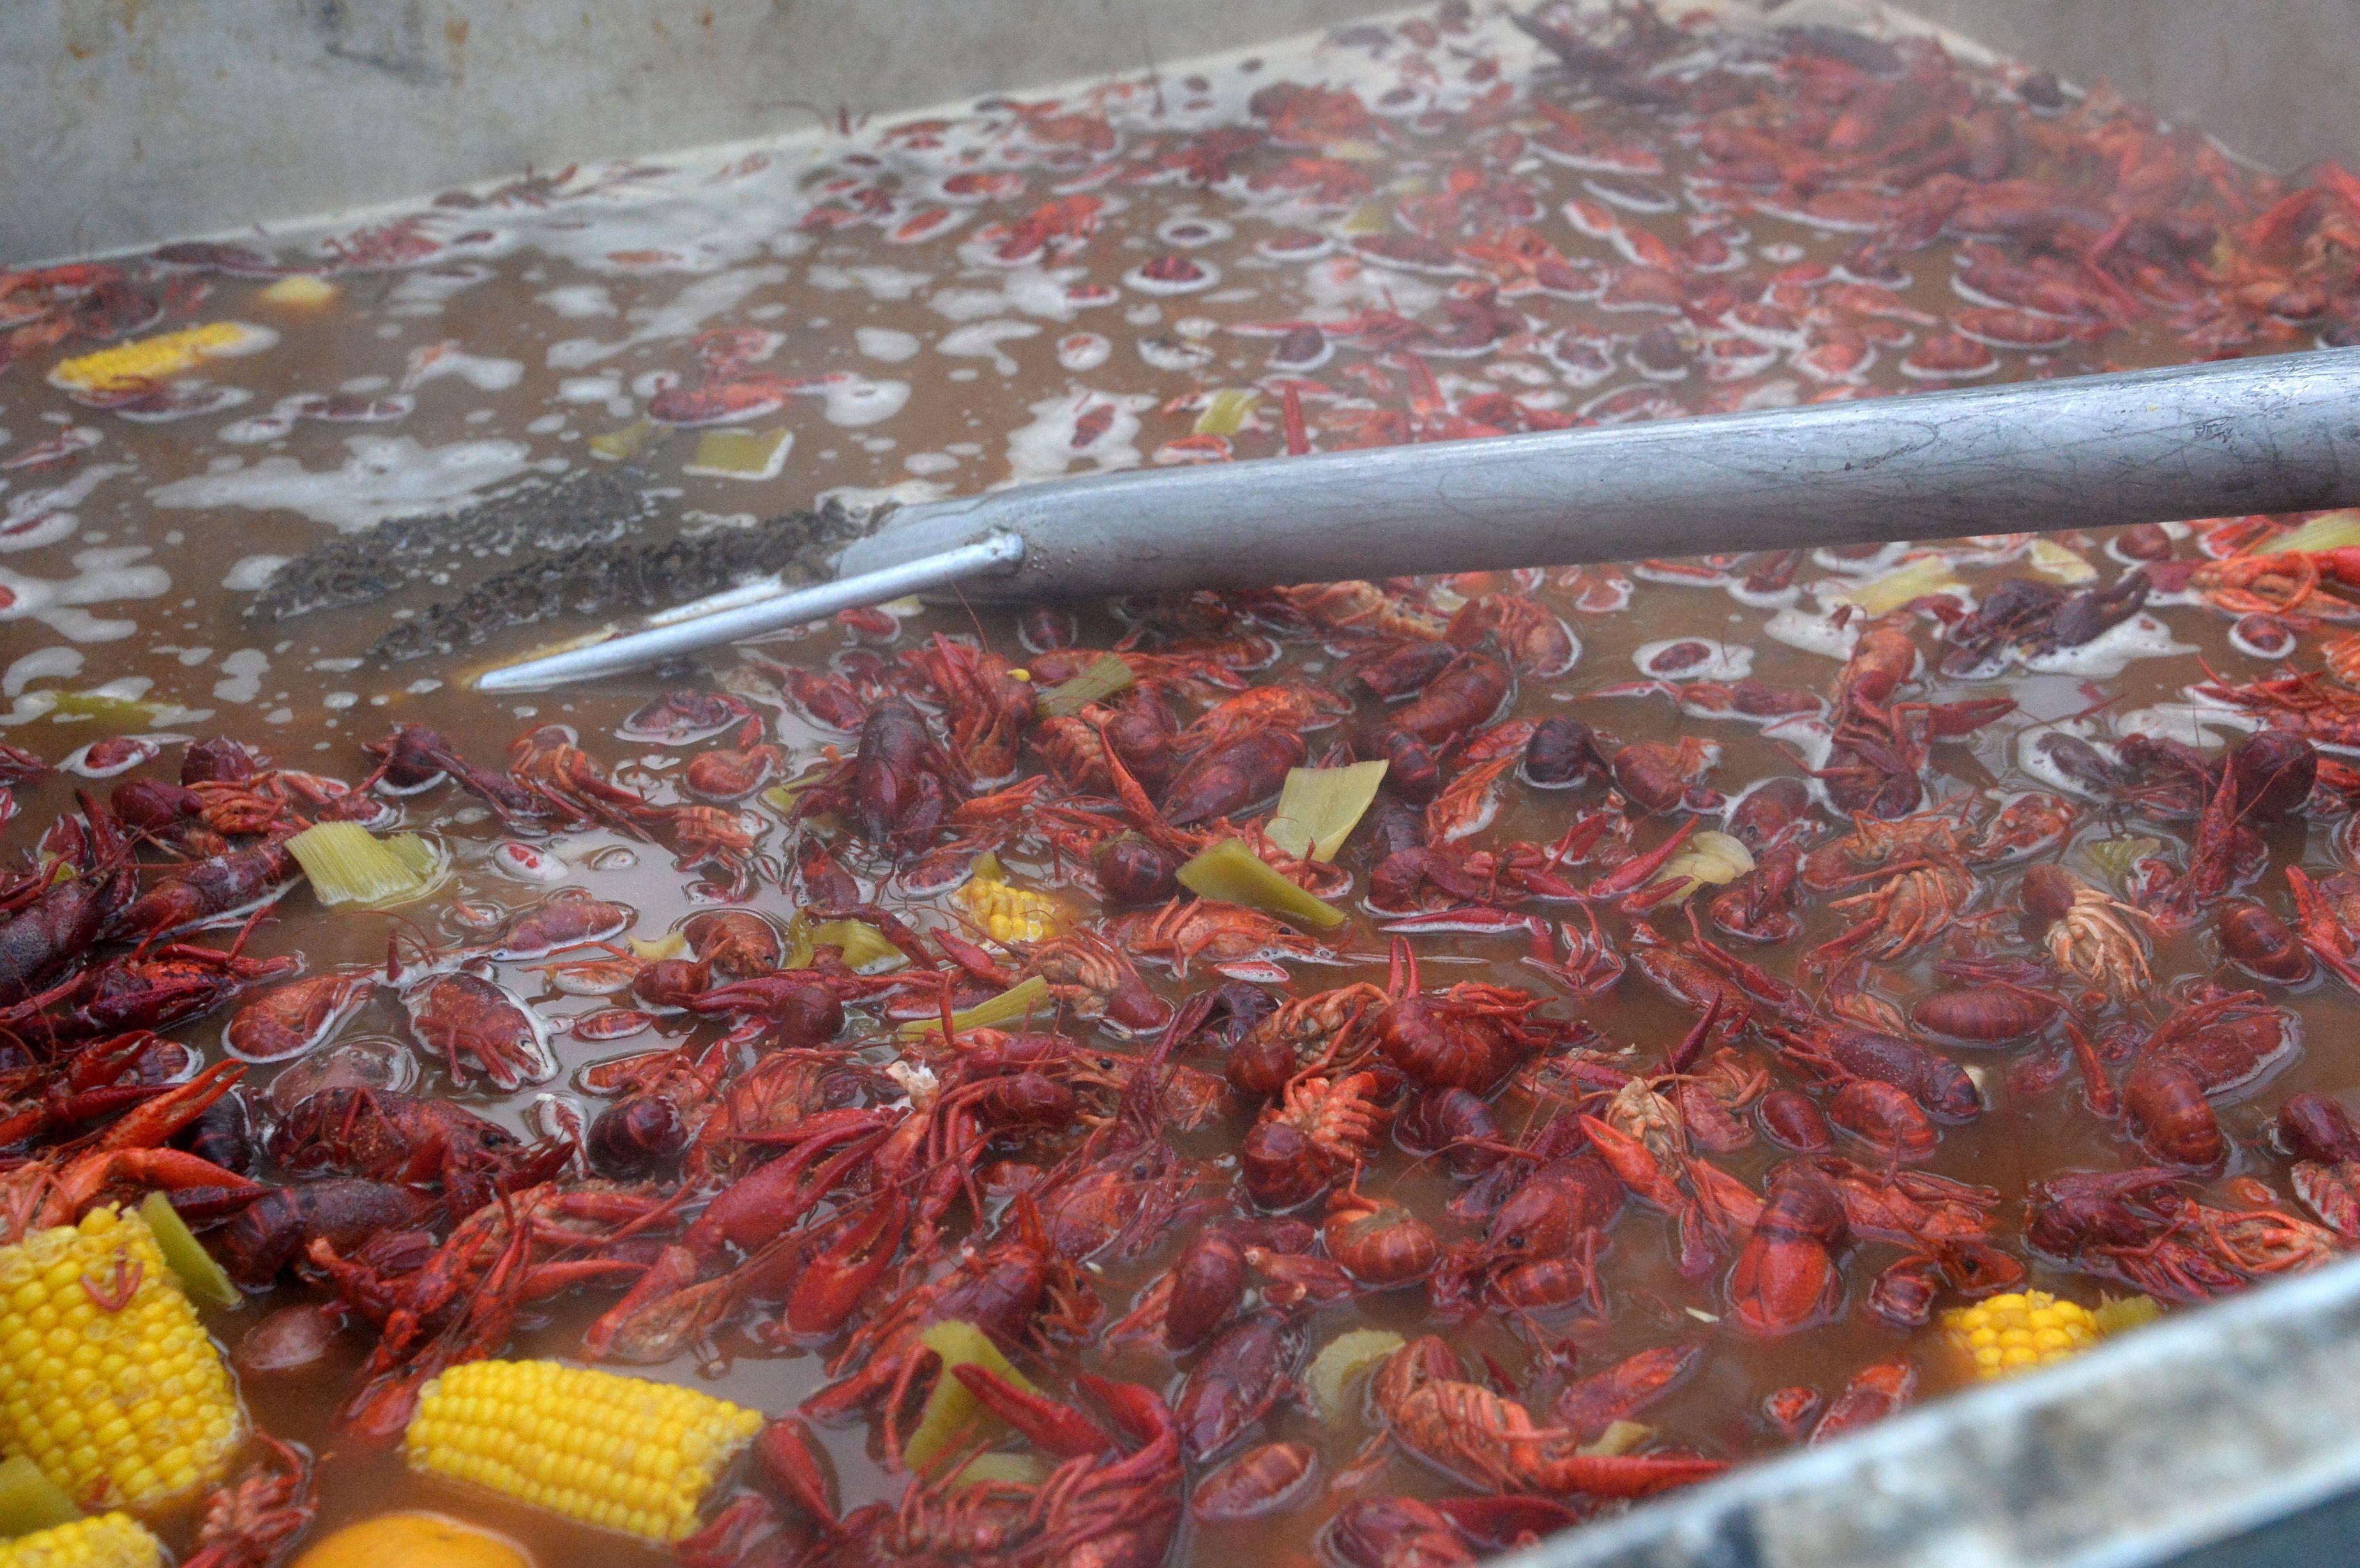 Crawfish boils are popular on the Gulf Coast.